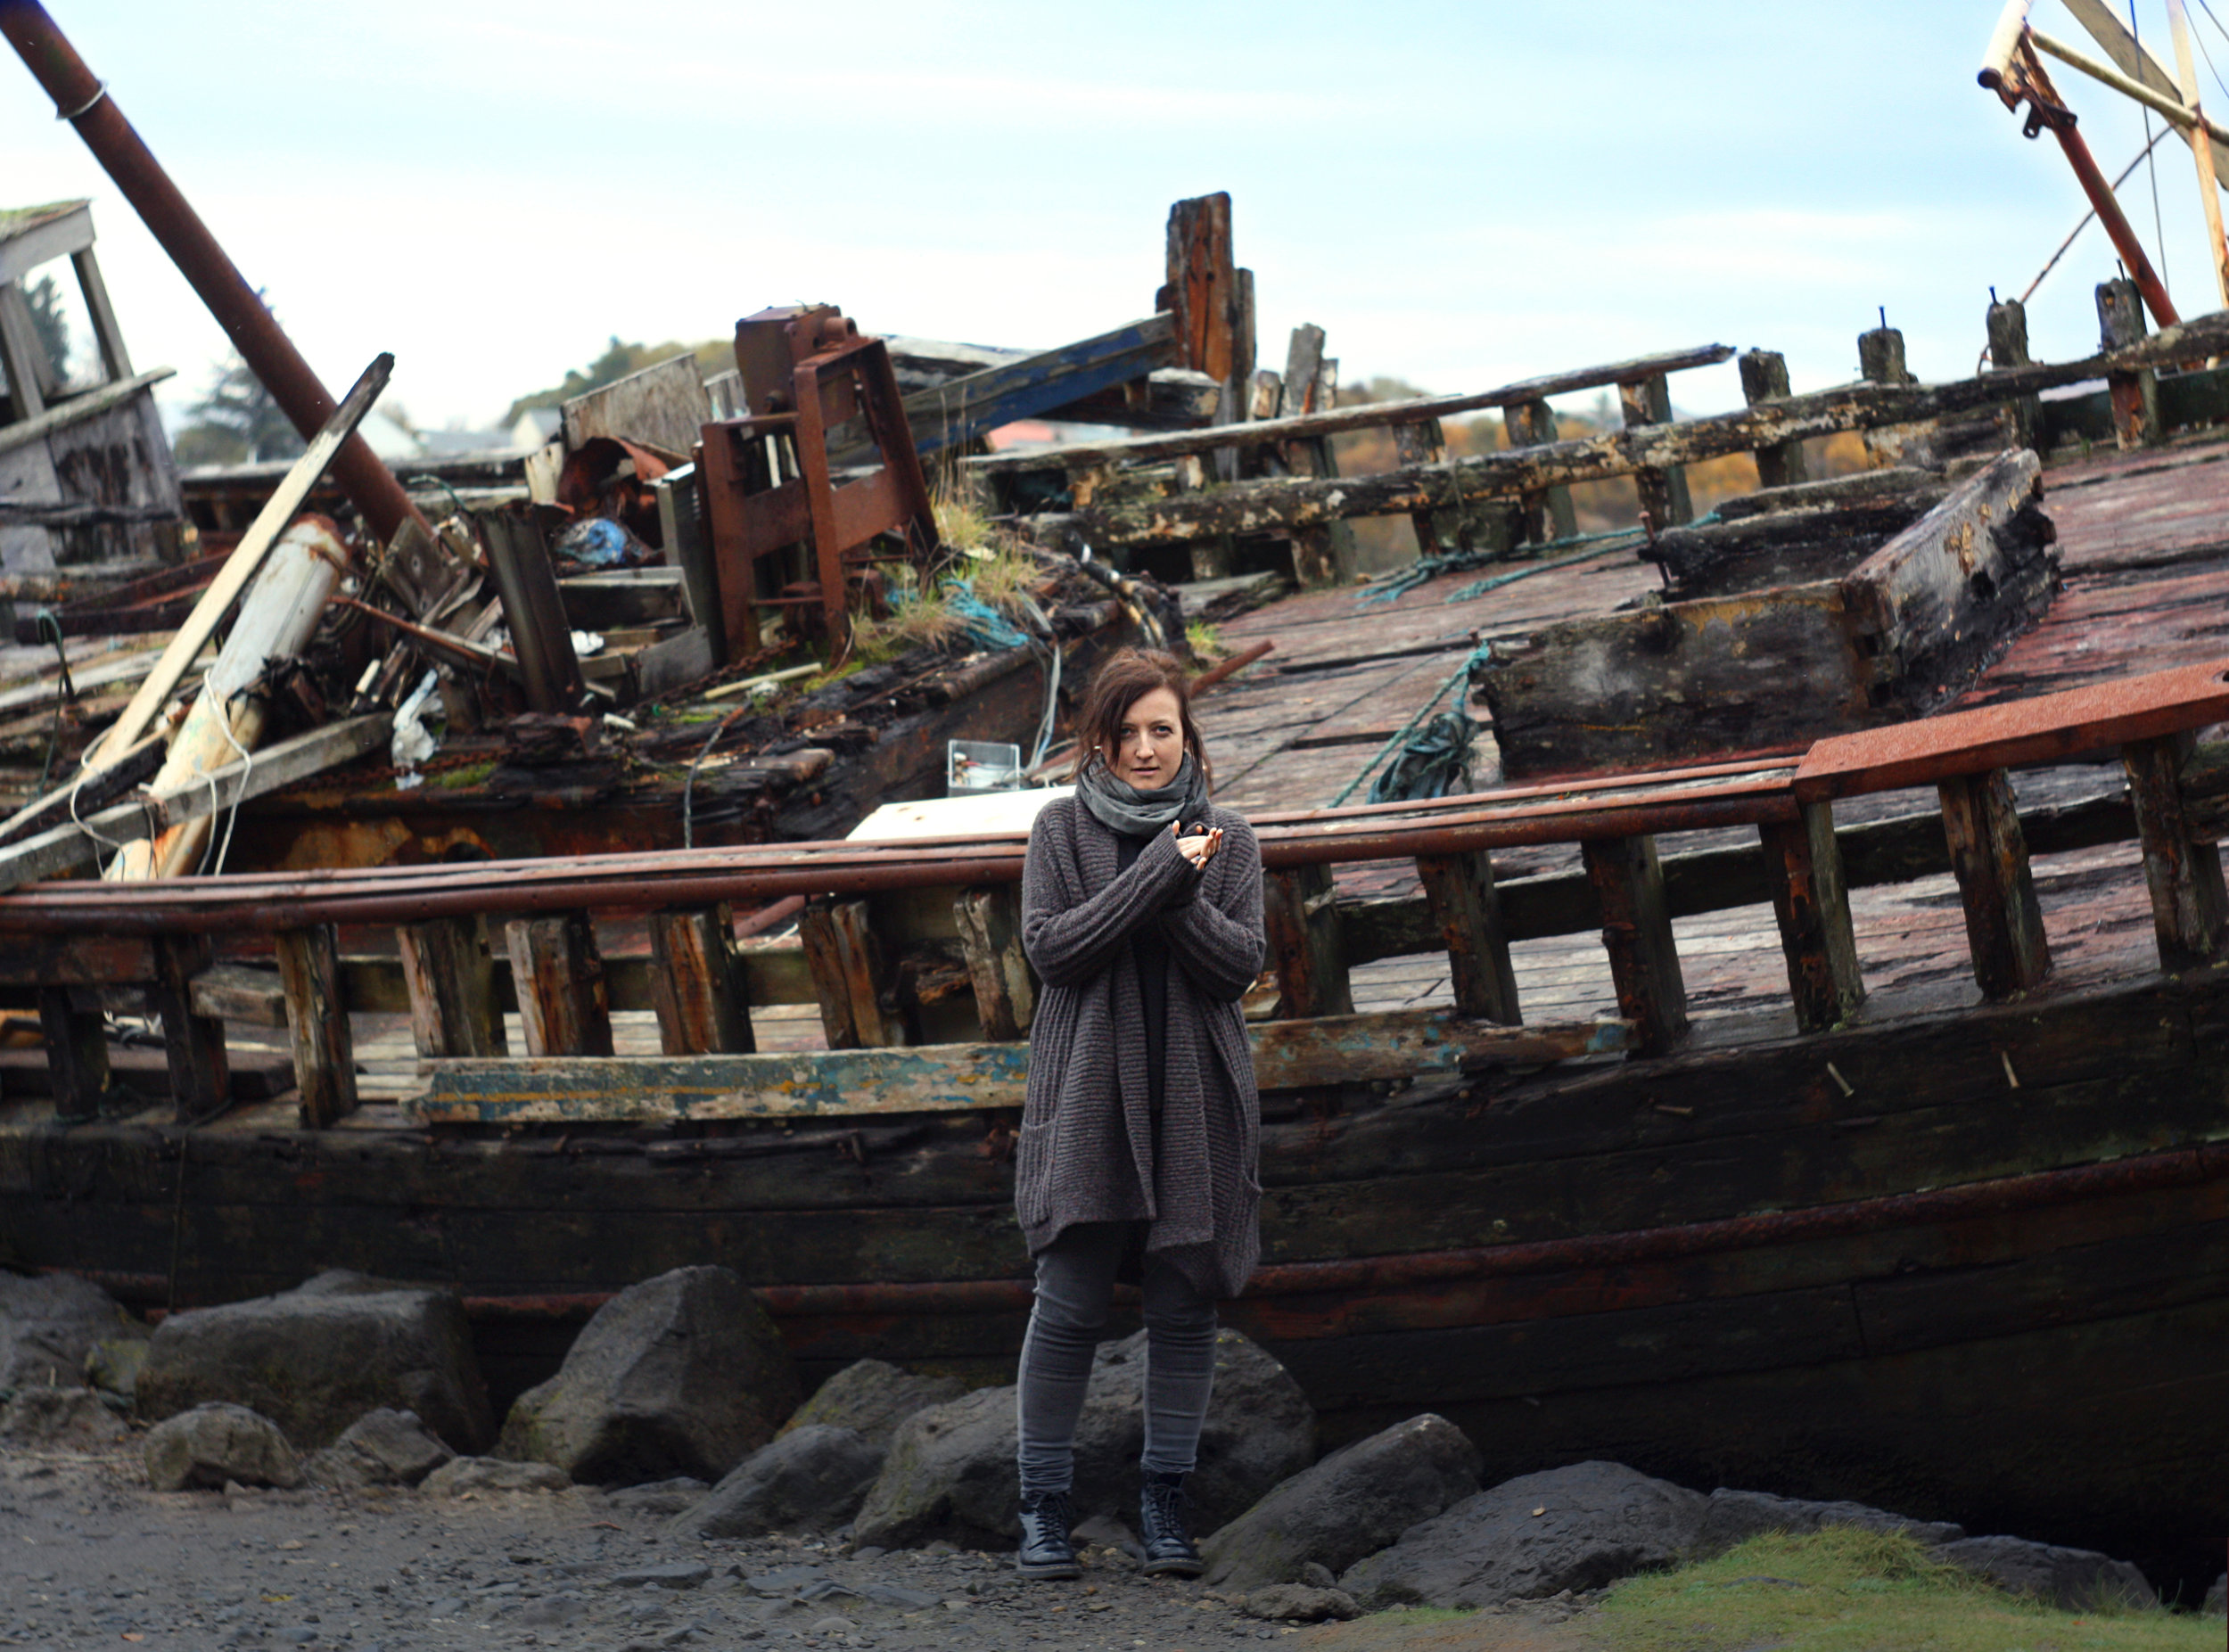 Isle of Mull - photo (c) Thom Ashworth